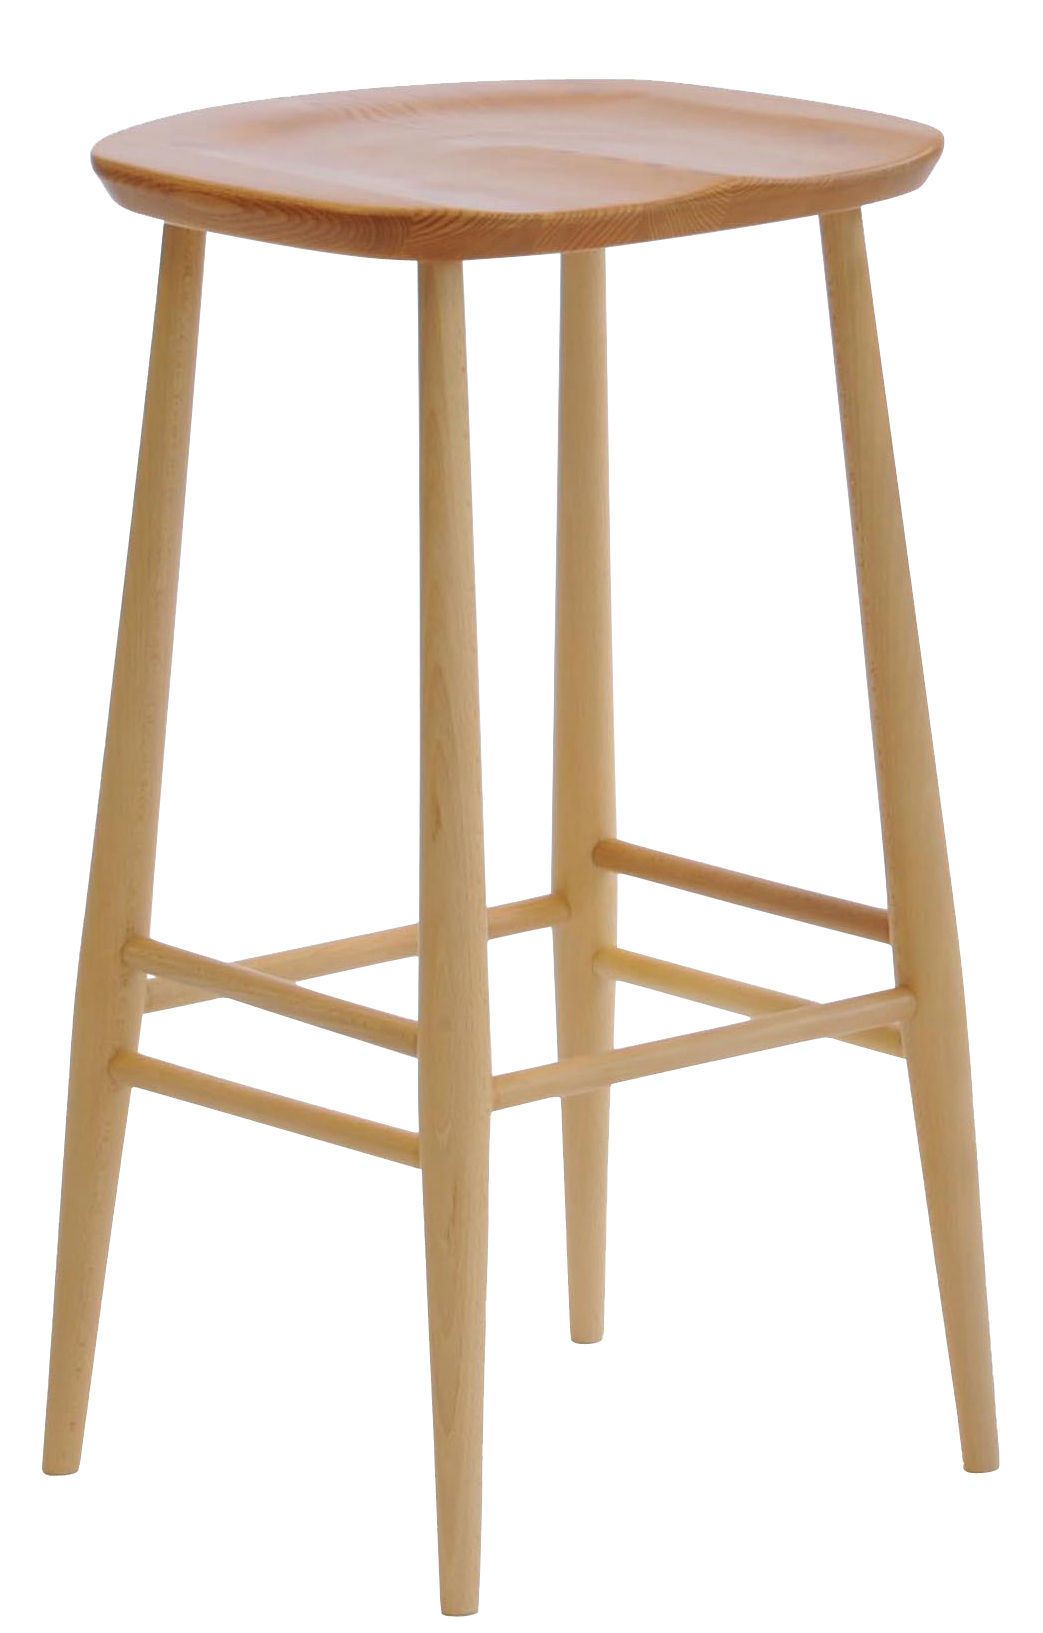 Furniture - Bar Stools - Bar Stool Bar stool - Wood H 65 cm - Reissue 1950' by Ercol - Natural wood - Ashwood, Hêtre tourné